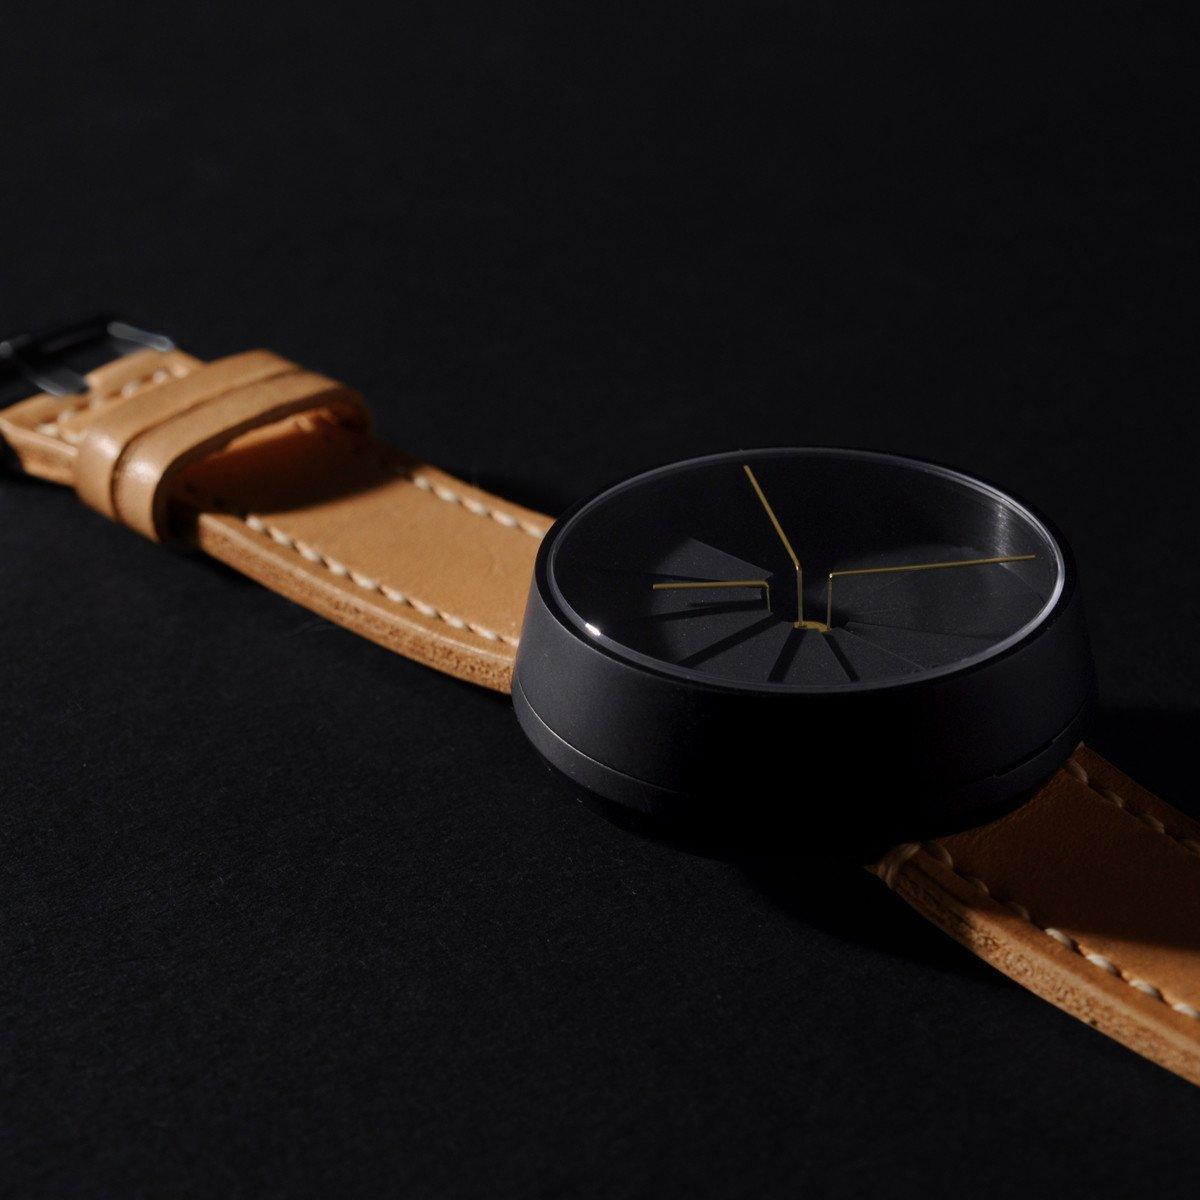 4th Dimension Concrete Wrist Watch, Midnight Edition-32715